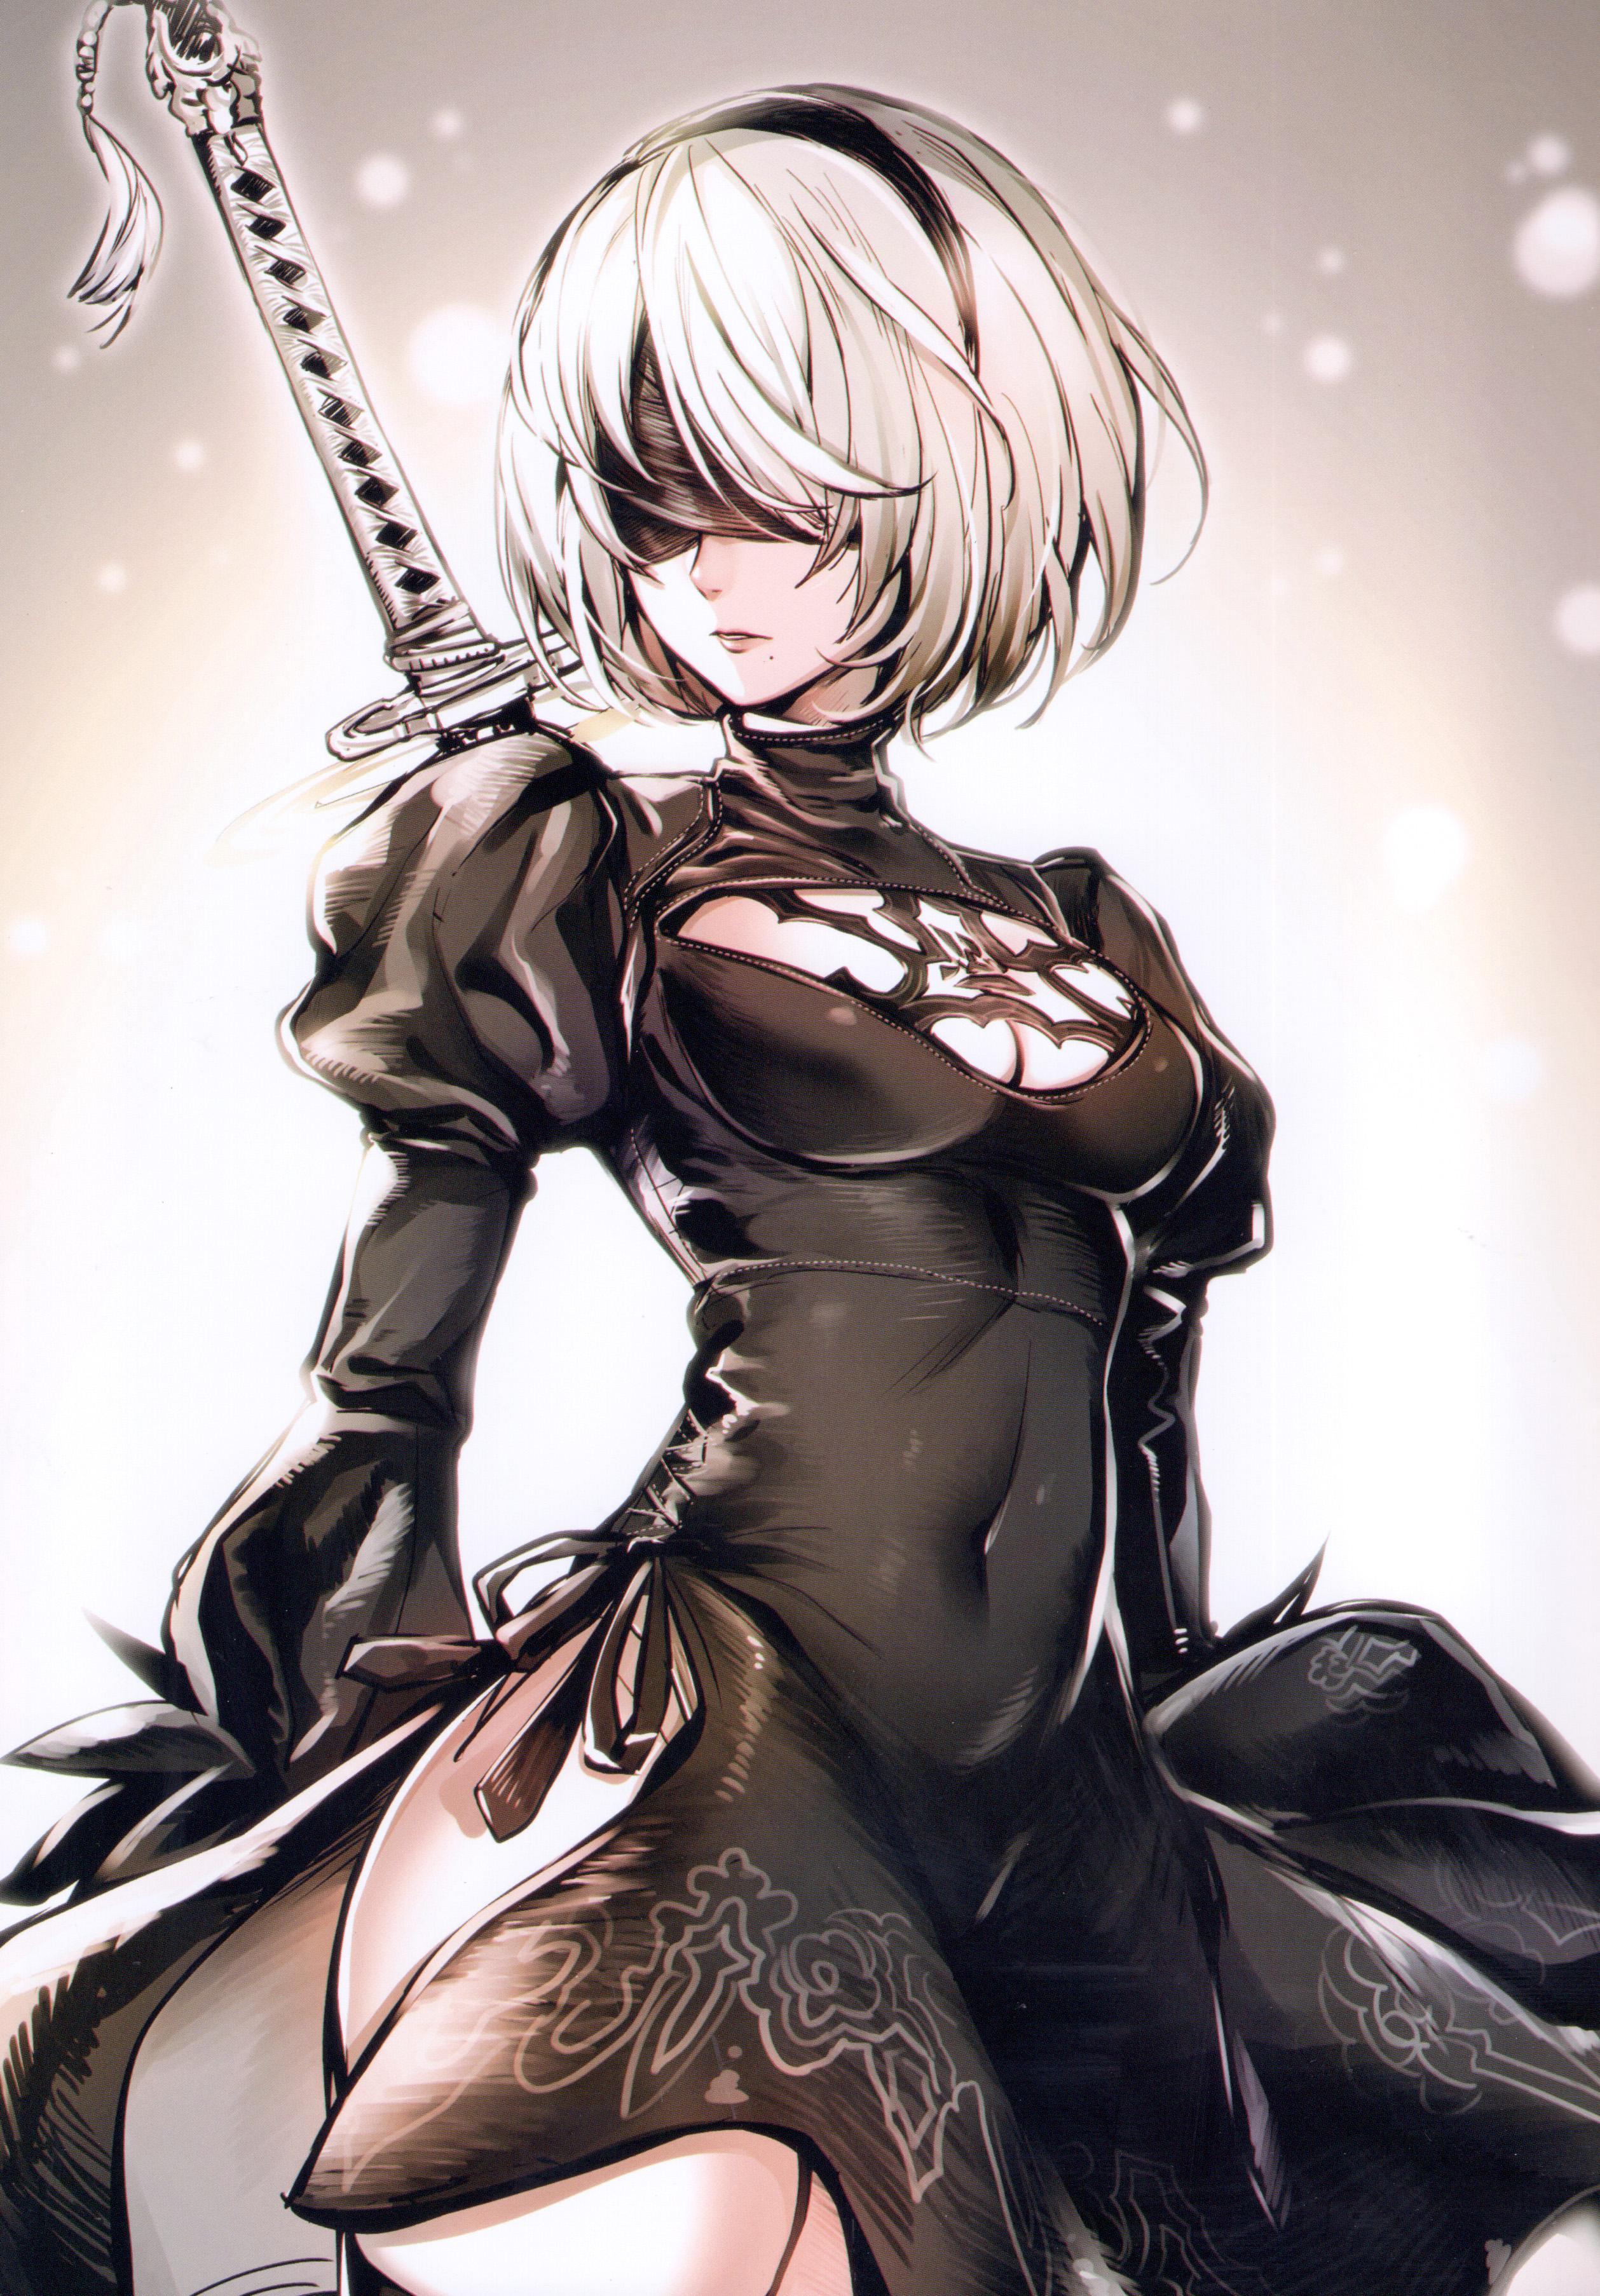 Anime 2517x3613 portrait display drawing Nier: Automata NieR Yorha unit no.2 type b Cut (artist) blindfold short hair white hair dress sword